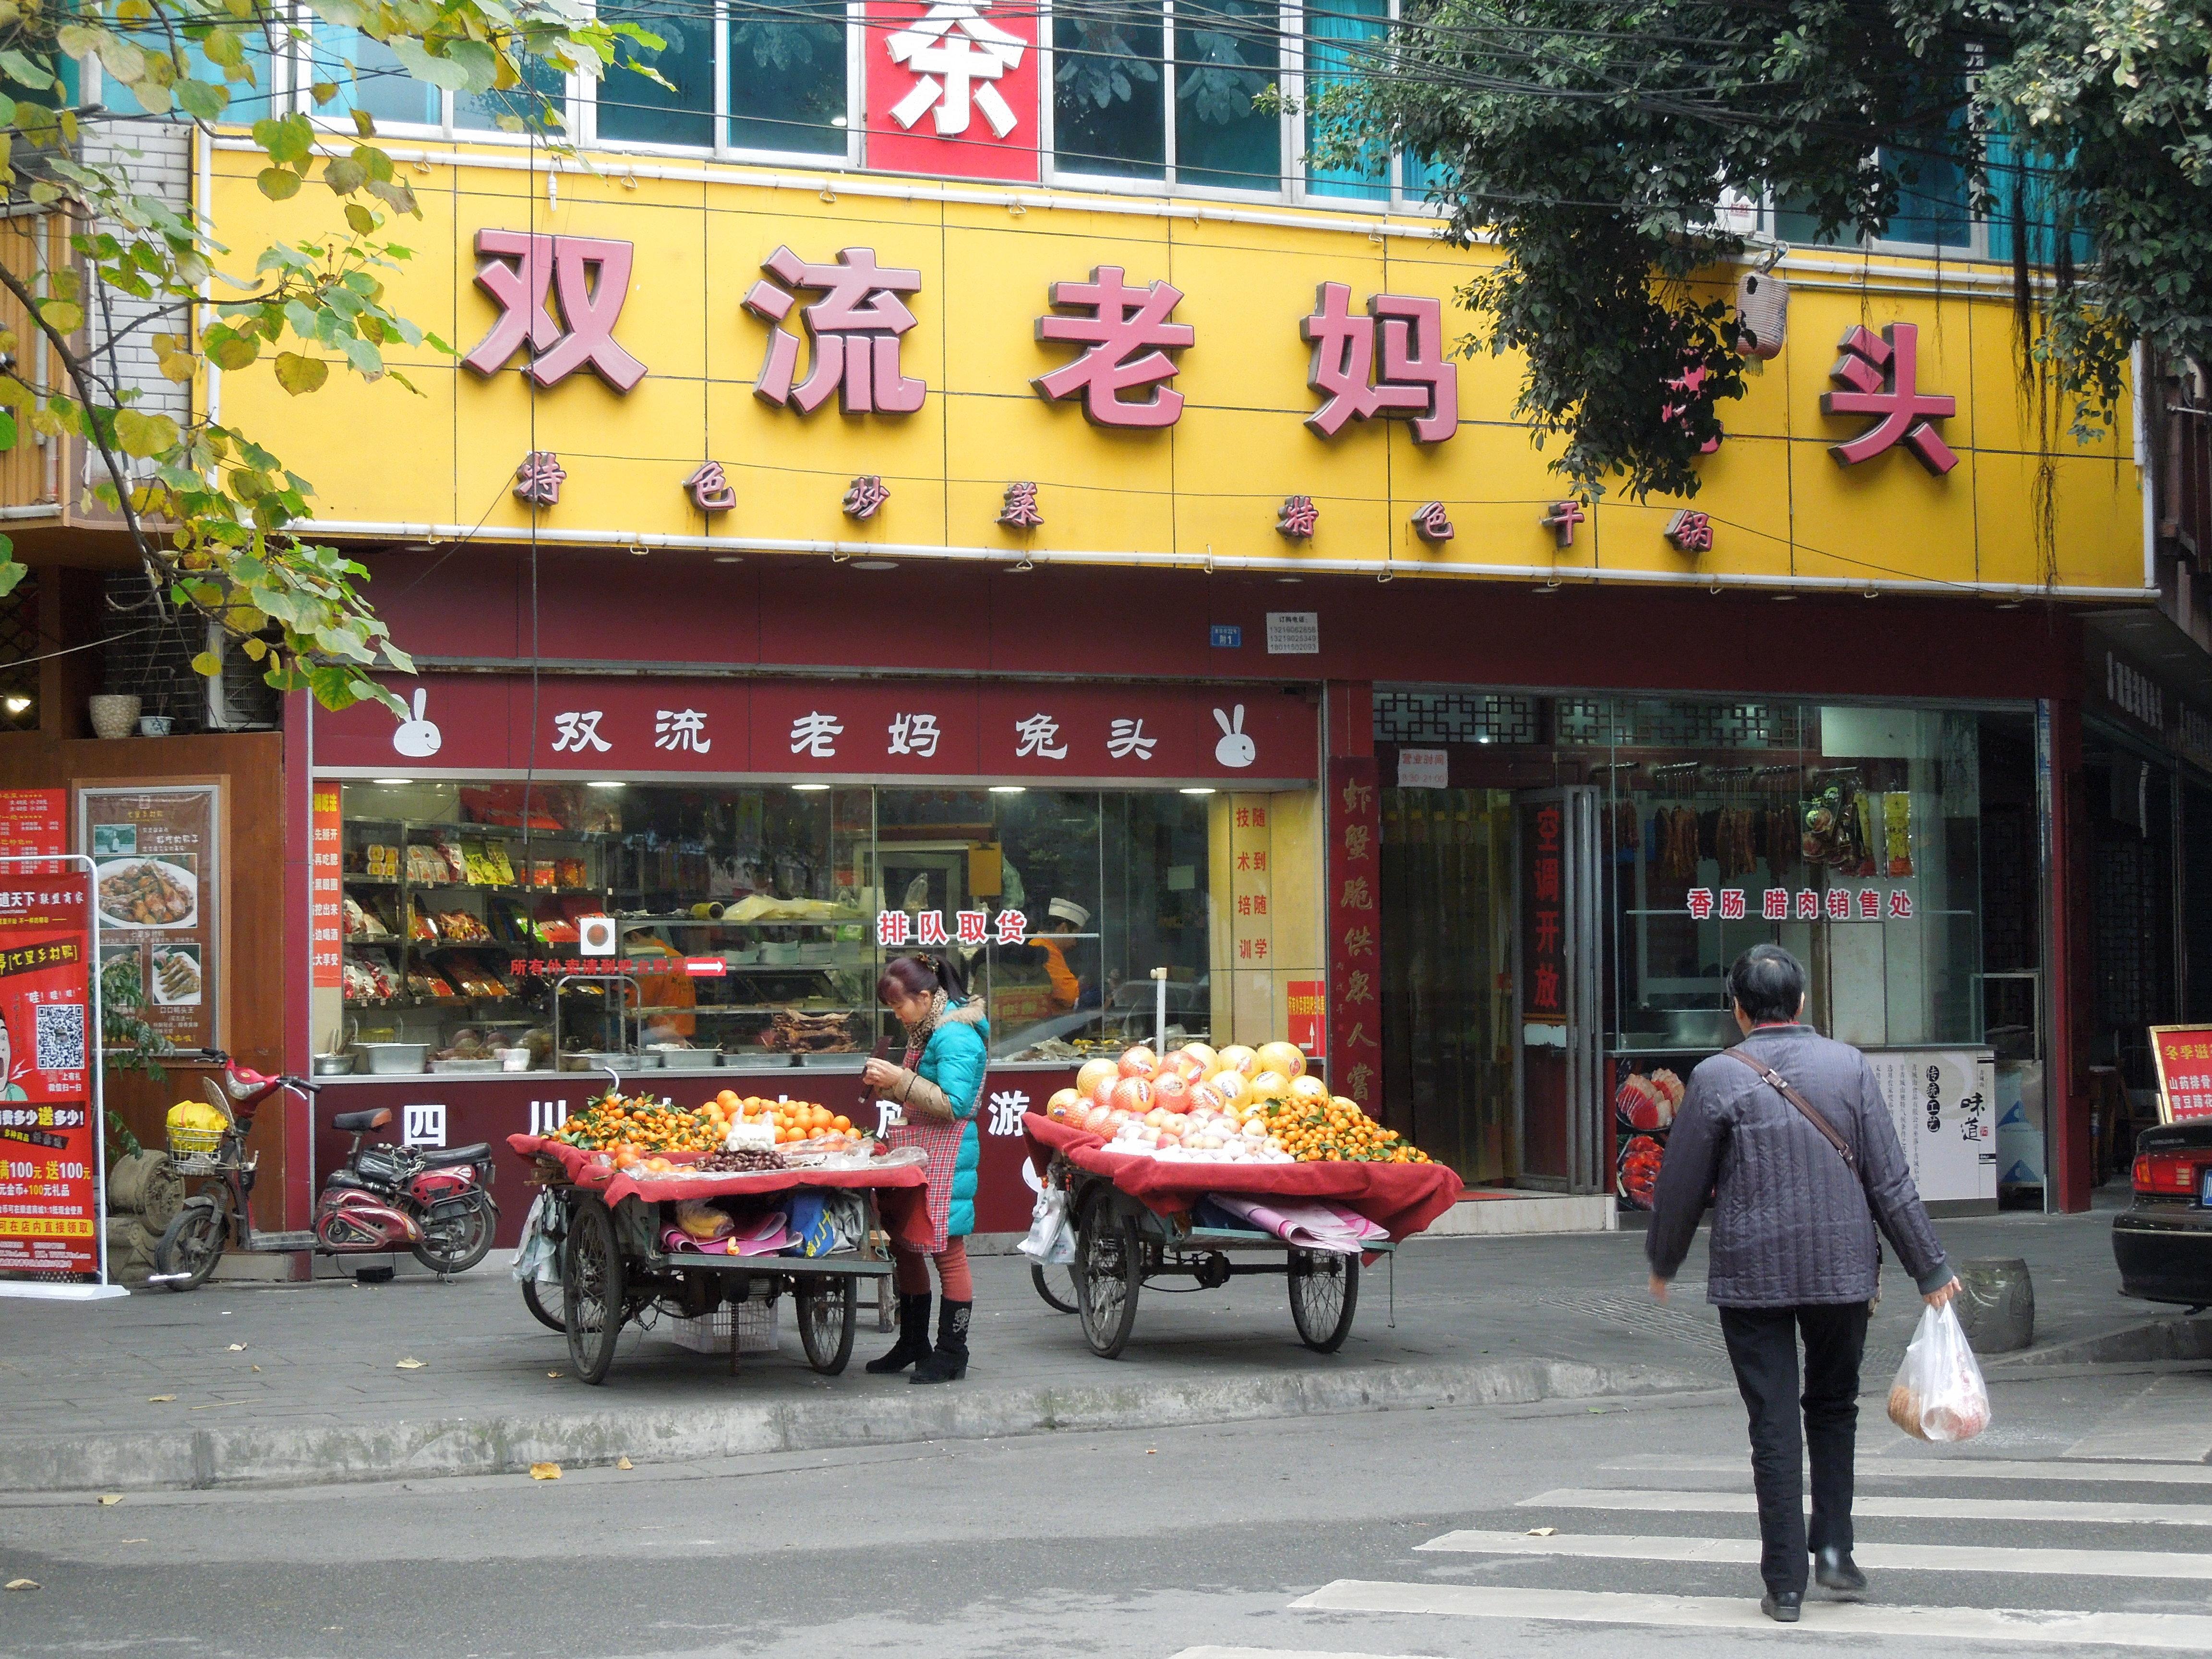 kiina ruoka katuruoka